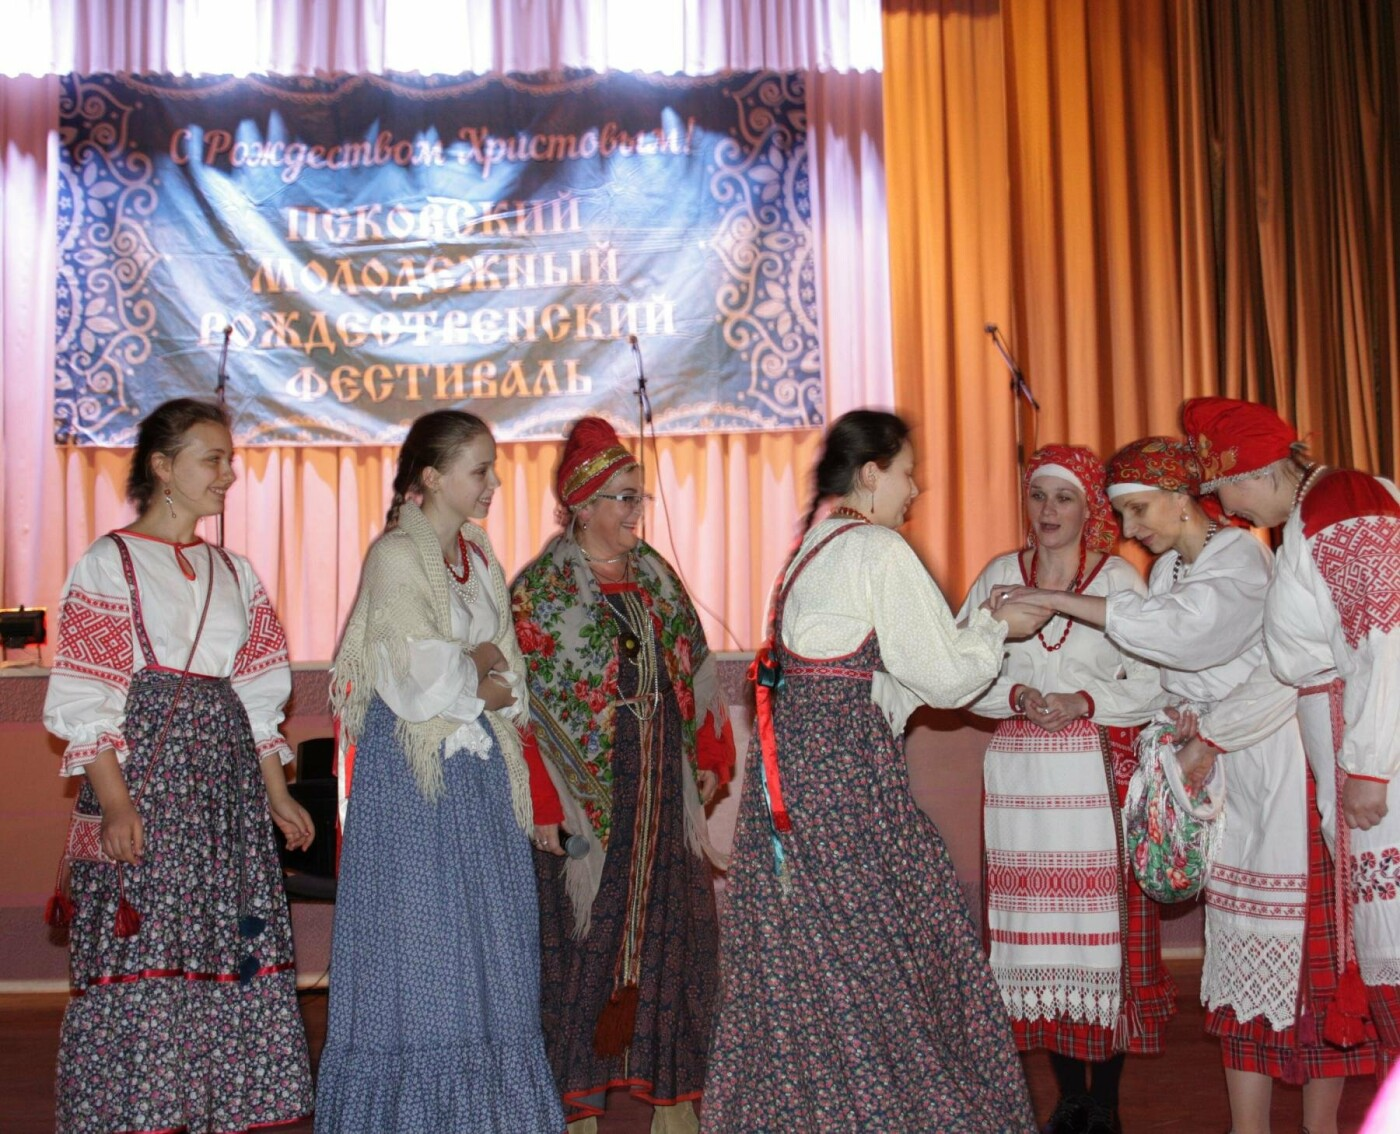 12 января в Пскове прошел Рождественский концерт в рамках VI Рождественского фестиваля (ФОТО), фото-7